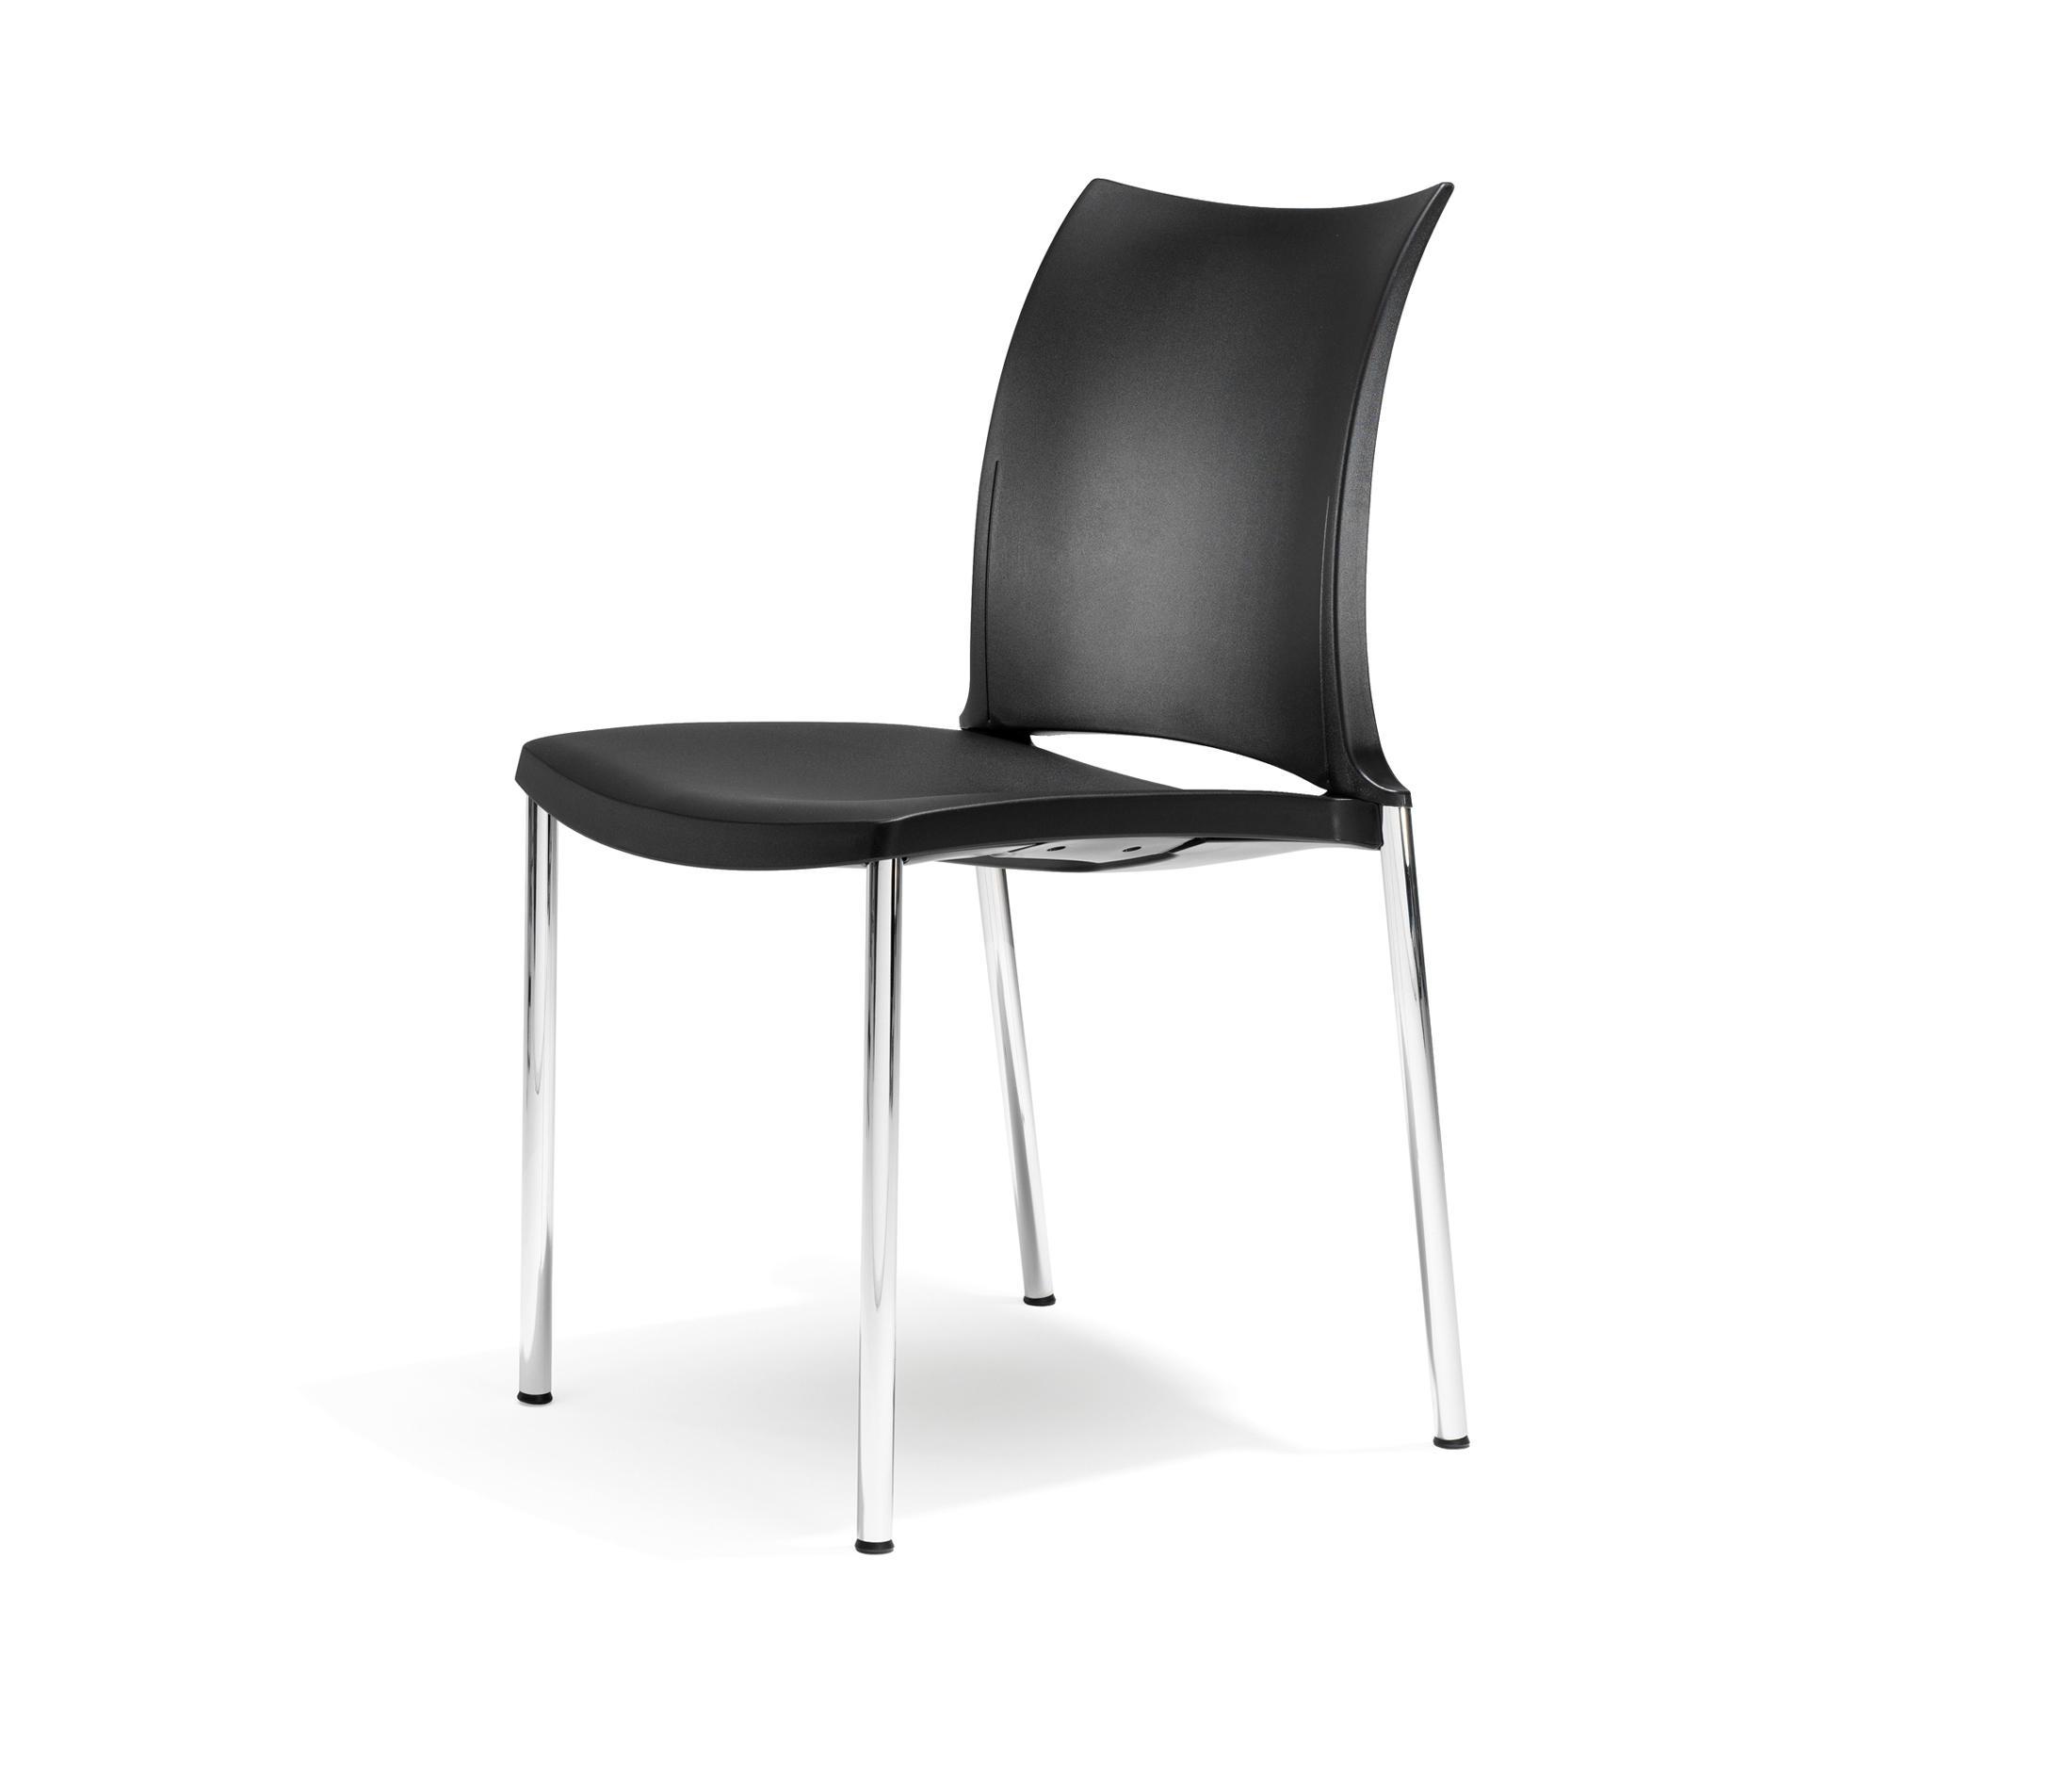 2200 2 hola besucherst hle von kusch co architonic. Black Bedroom Furniture Sets. Home Design Ideas